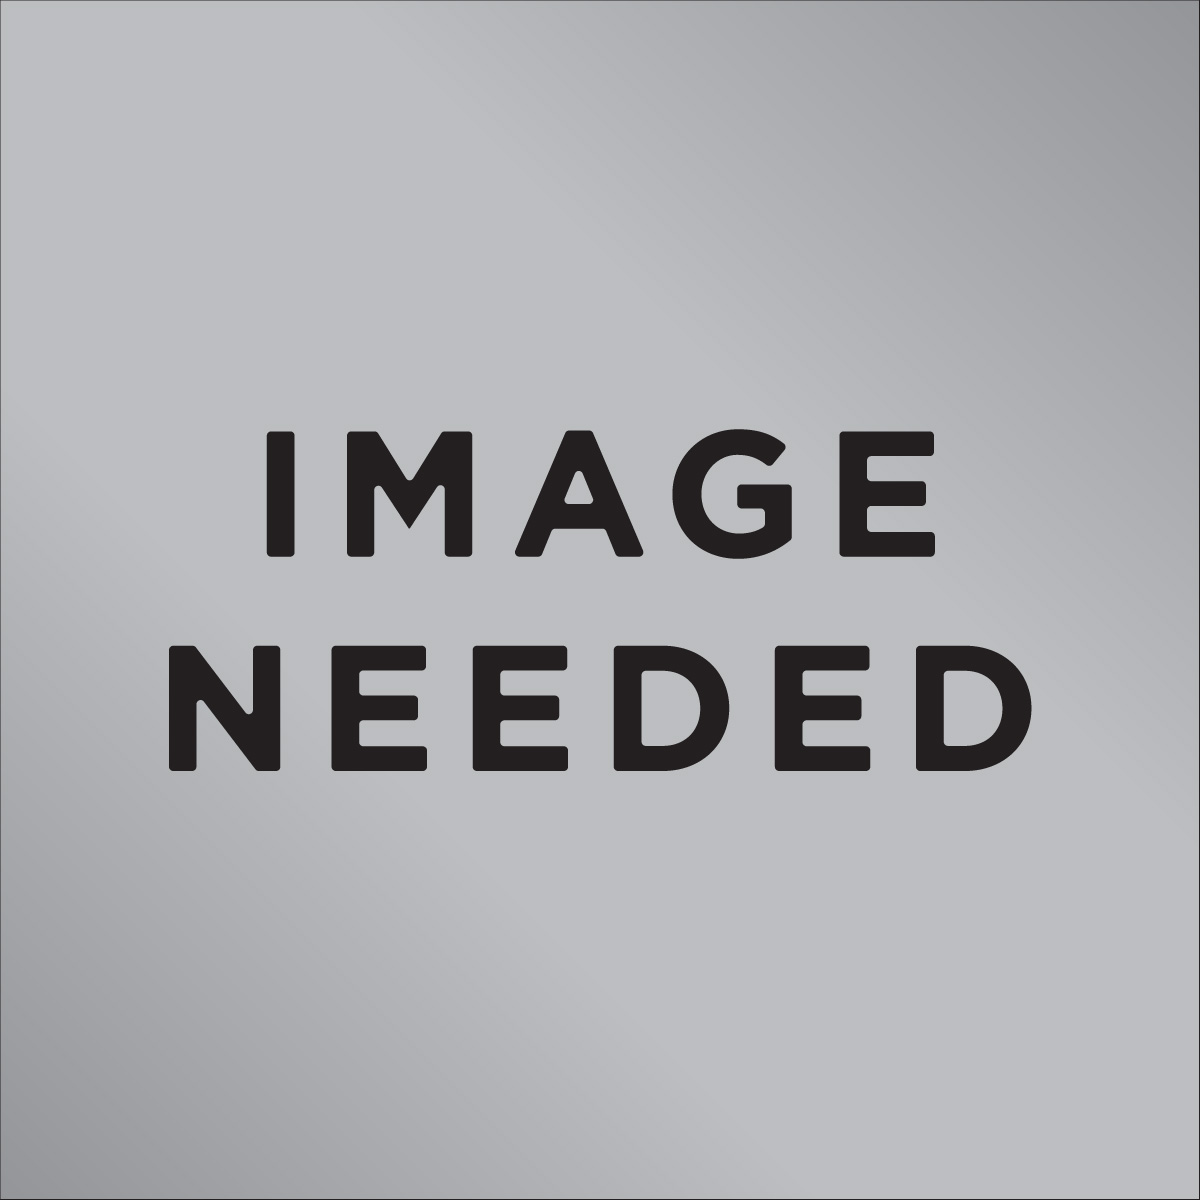 DAN SECOR  Designer / Color Separator Ext. 107  Click To Email